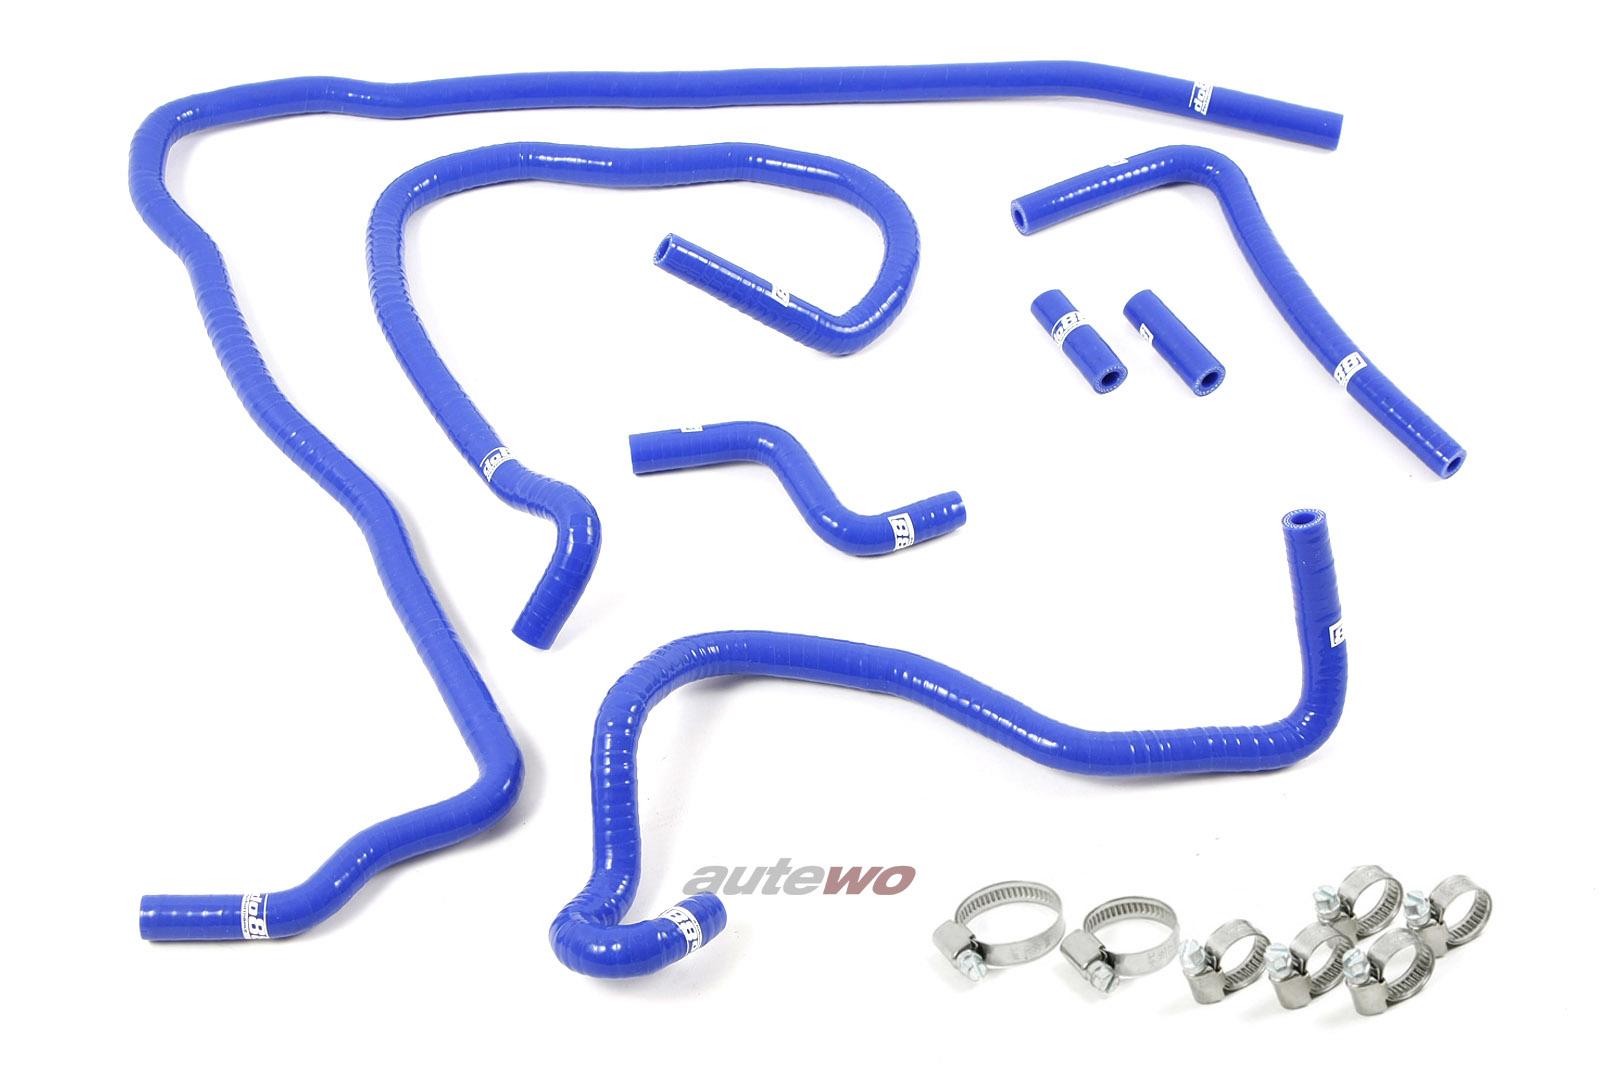 Audi S3 8L 1.8 Turbo 20V Turbo APY/AUL Silikon-Unterdruckschlauchset + Klemmen blau